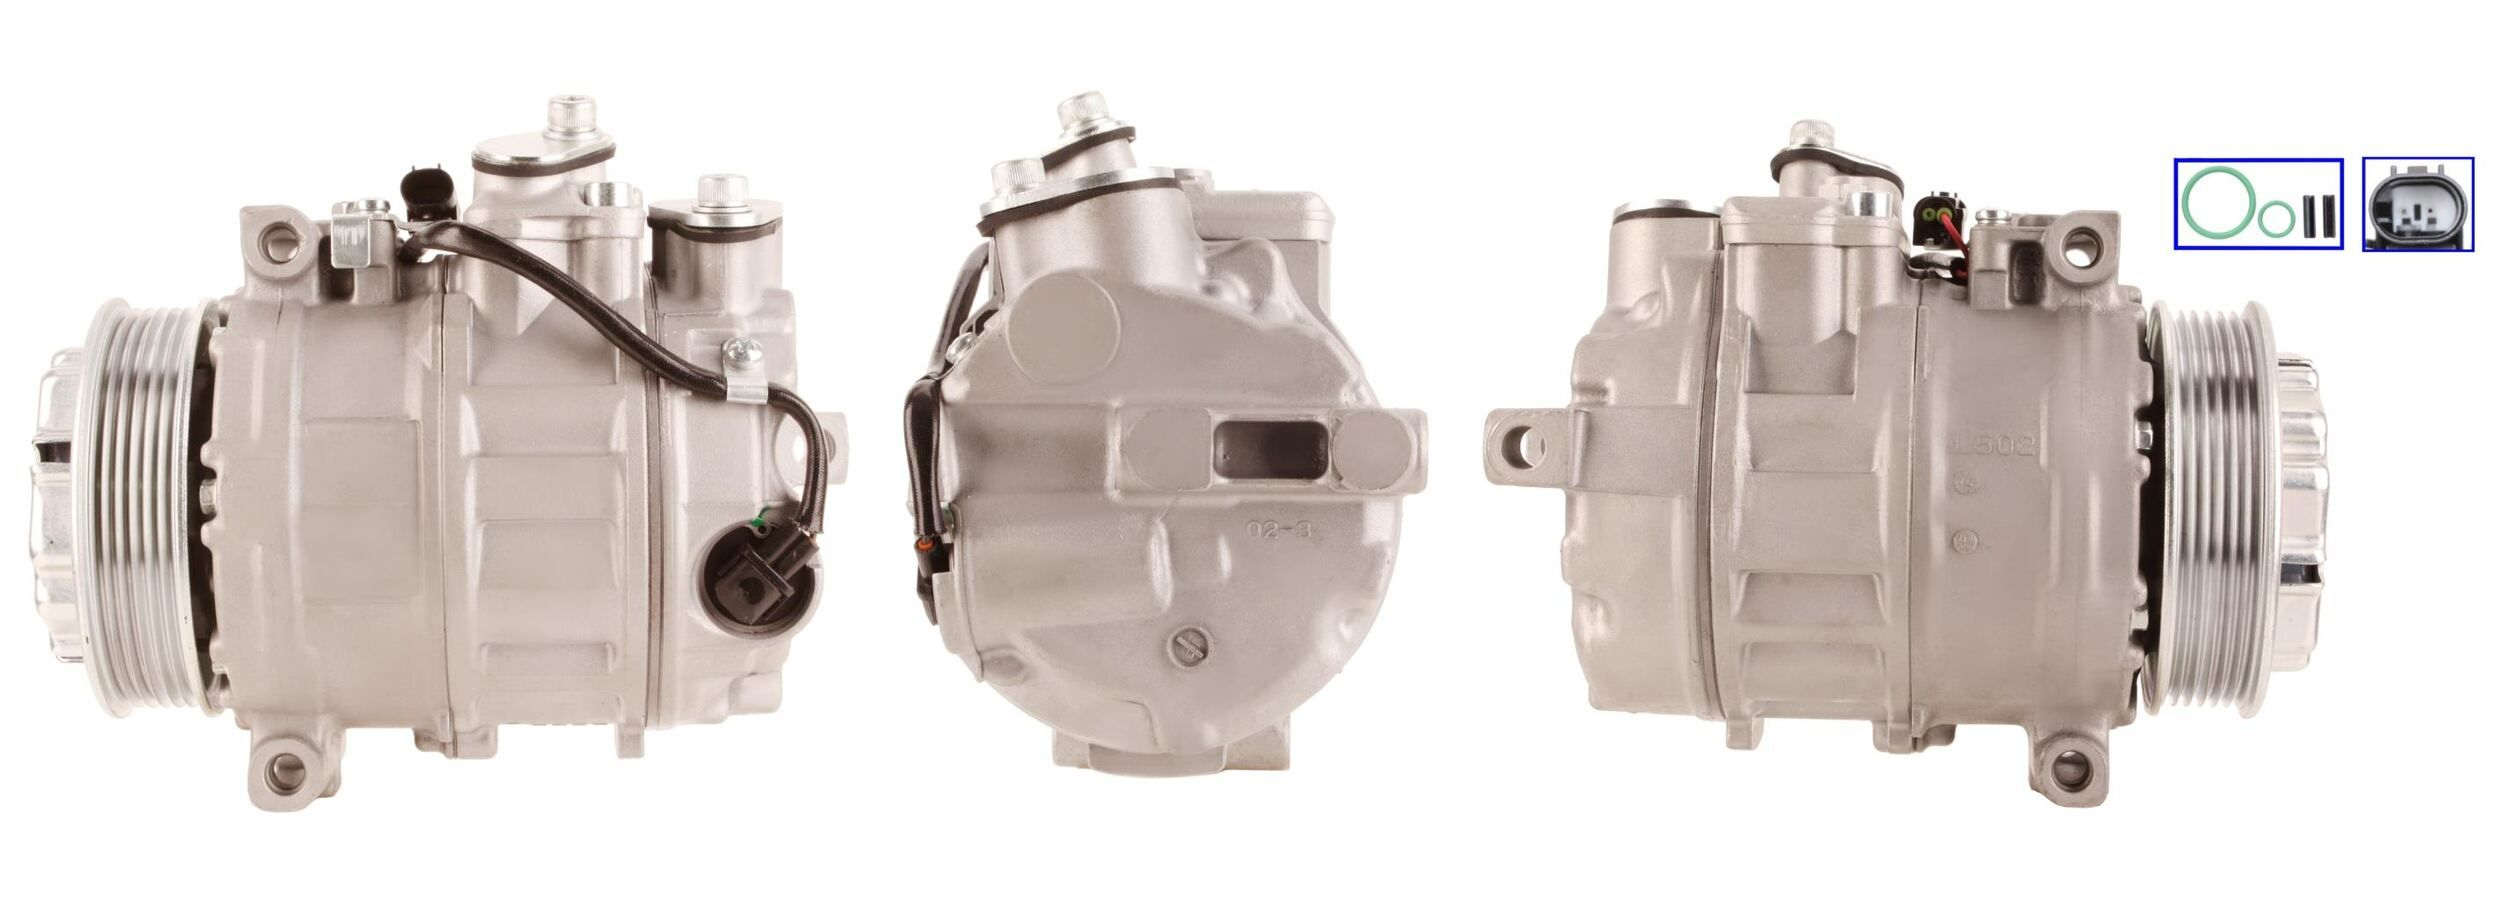 Kompressor ELSTOCK 51-0142